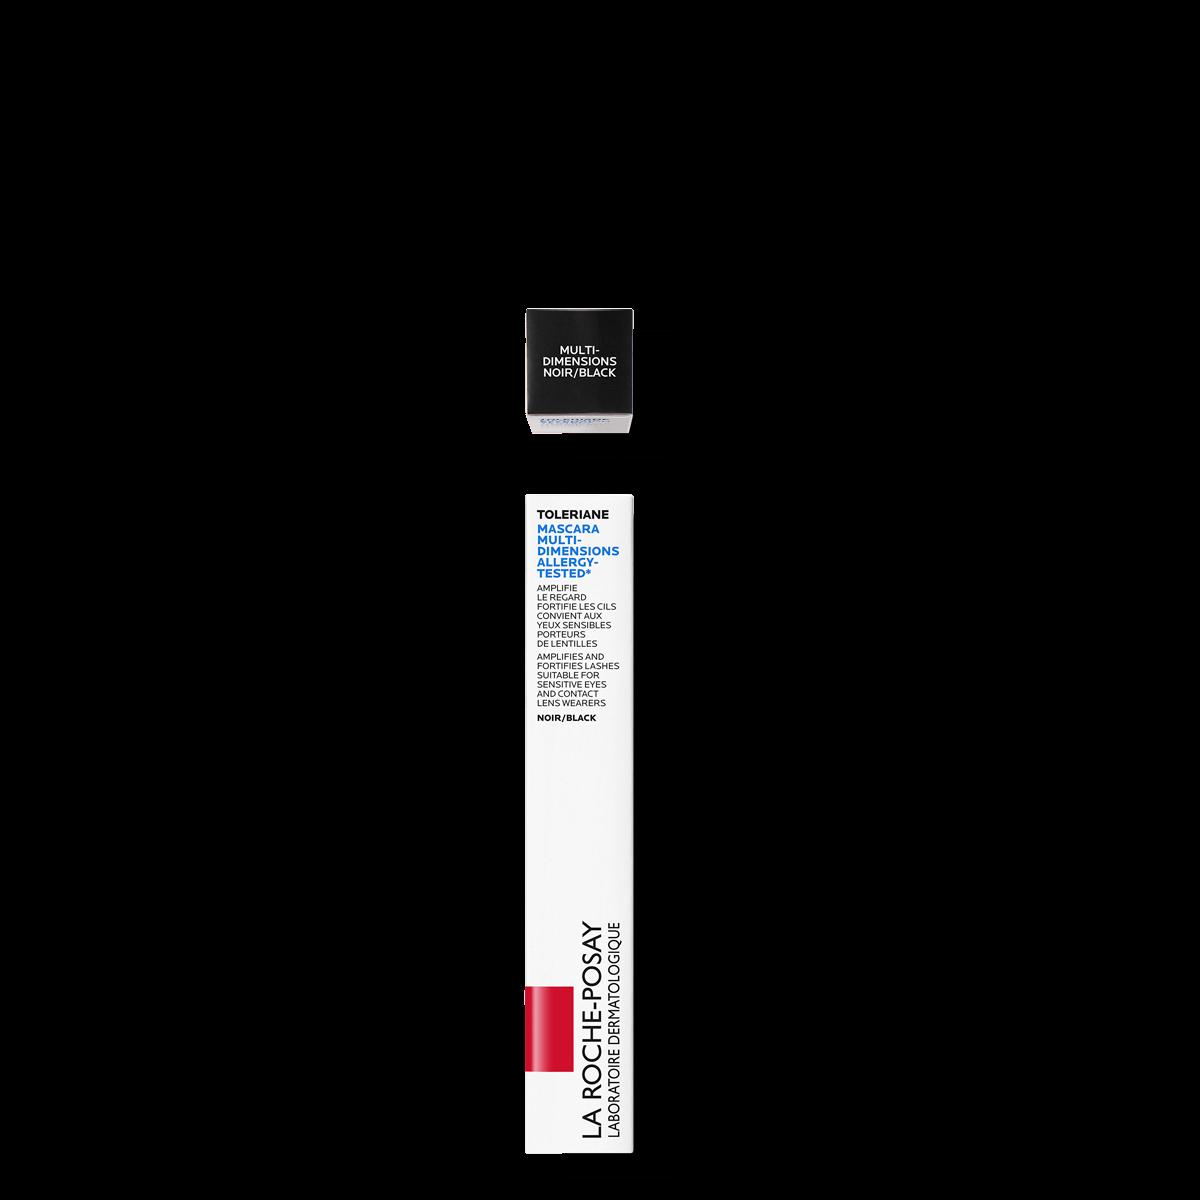 La Roche Posay Sensitiv Toleriane Sminke MULTIDIMENSIONS MASCARA Sor